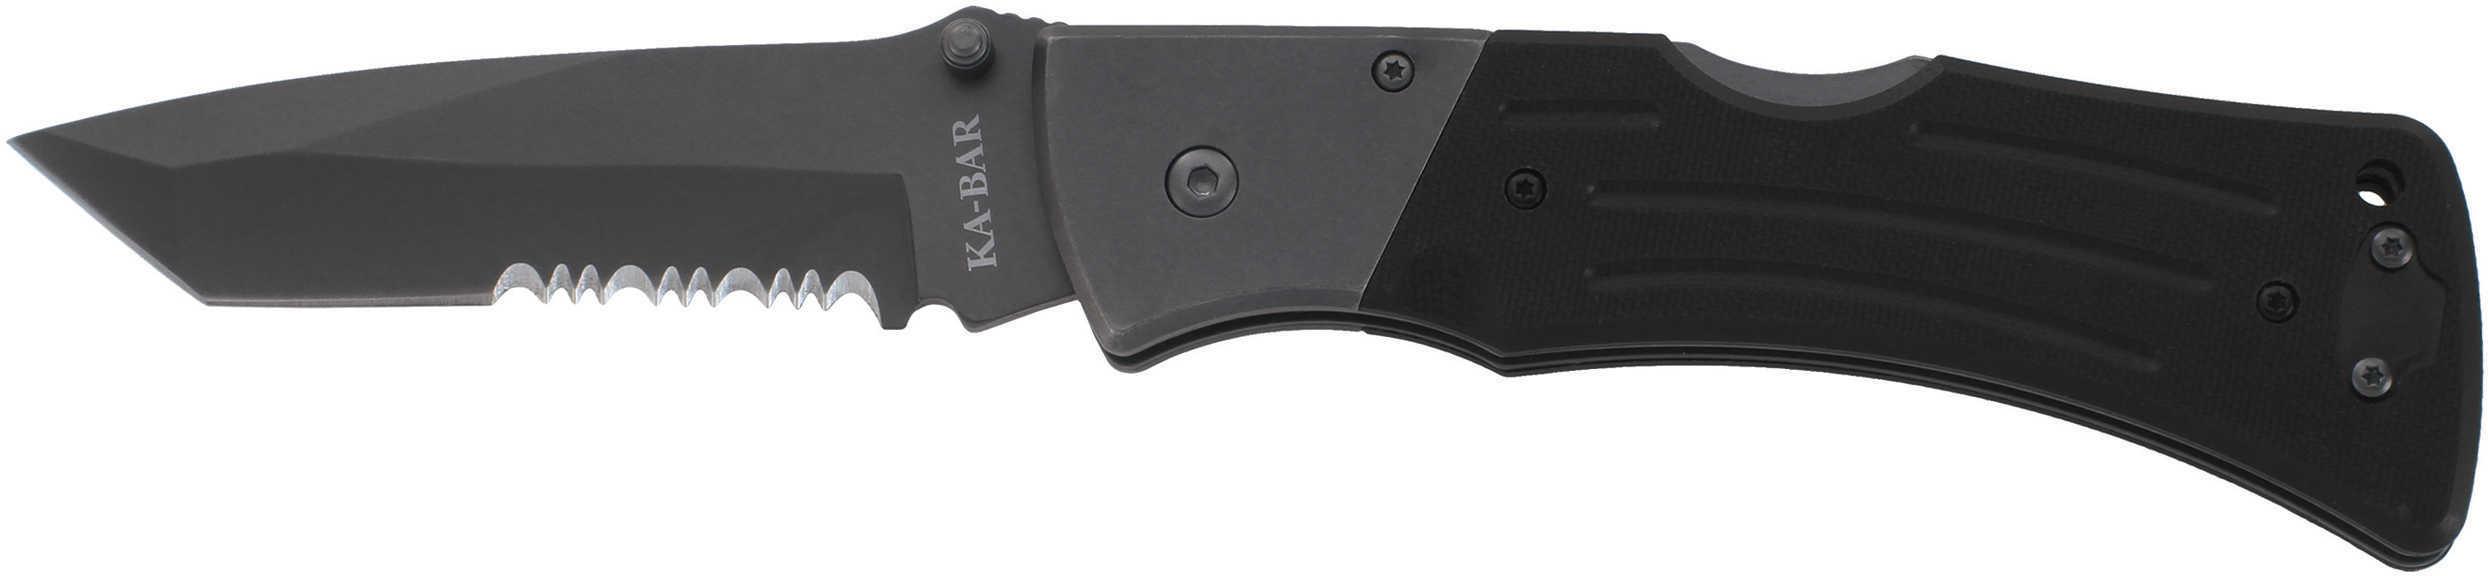 Ka-Bar G10 Mule Folder Tanto Blade, Serrated Edge Md: 2-3065-3